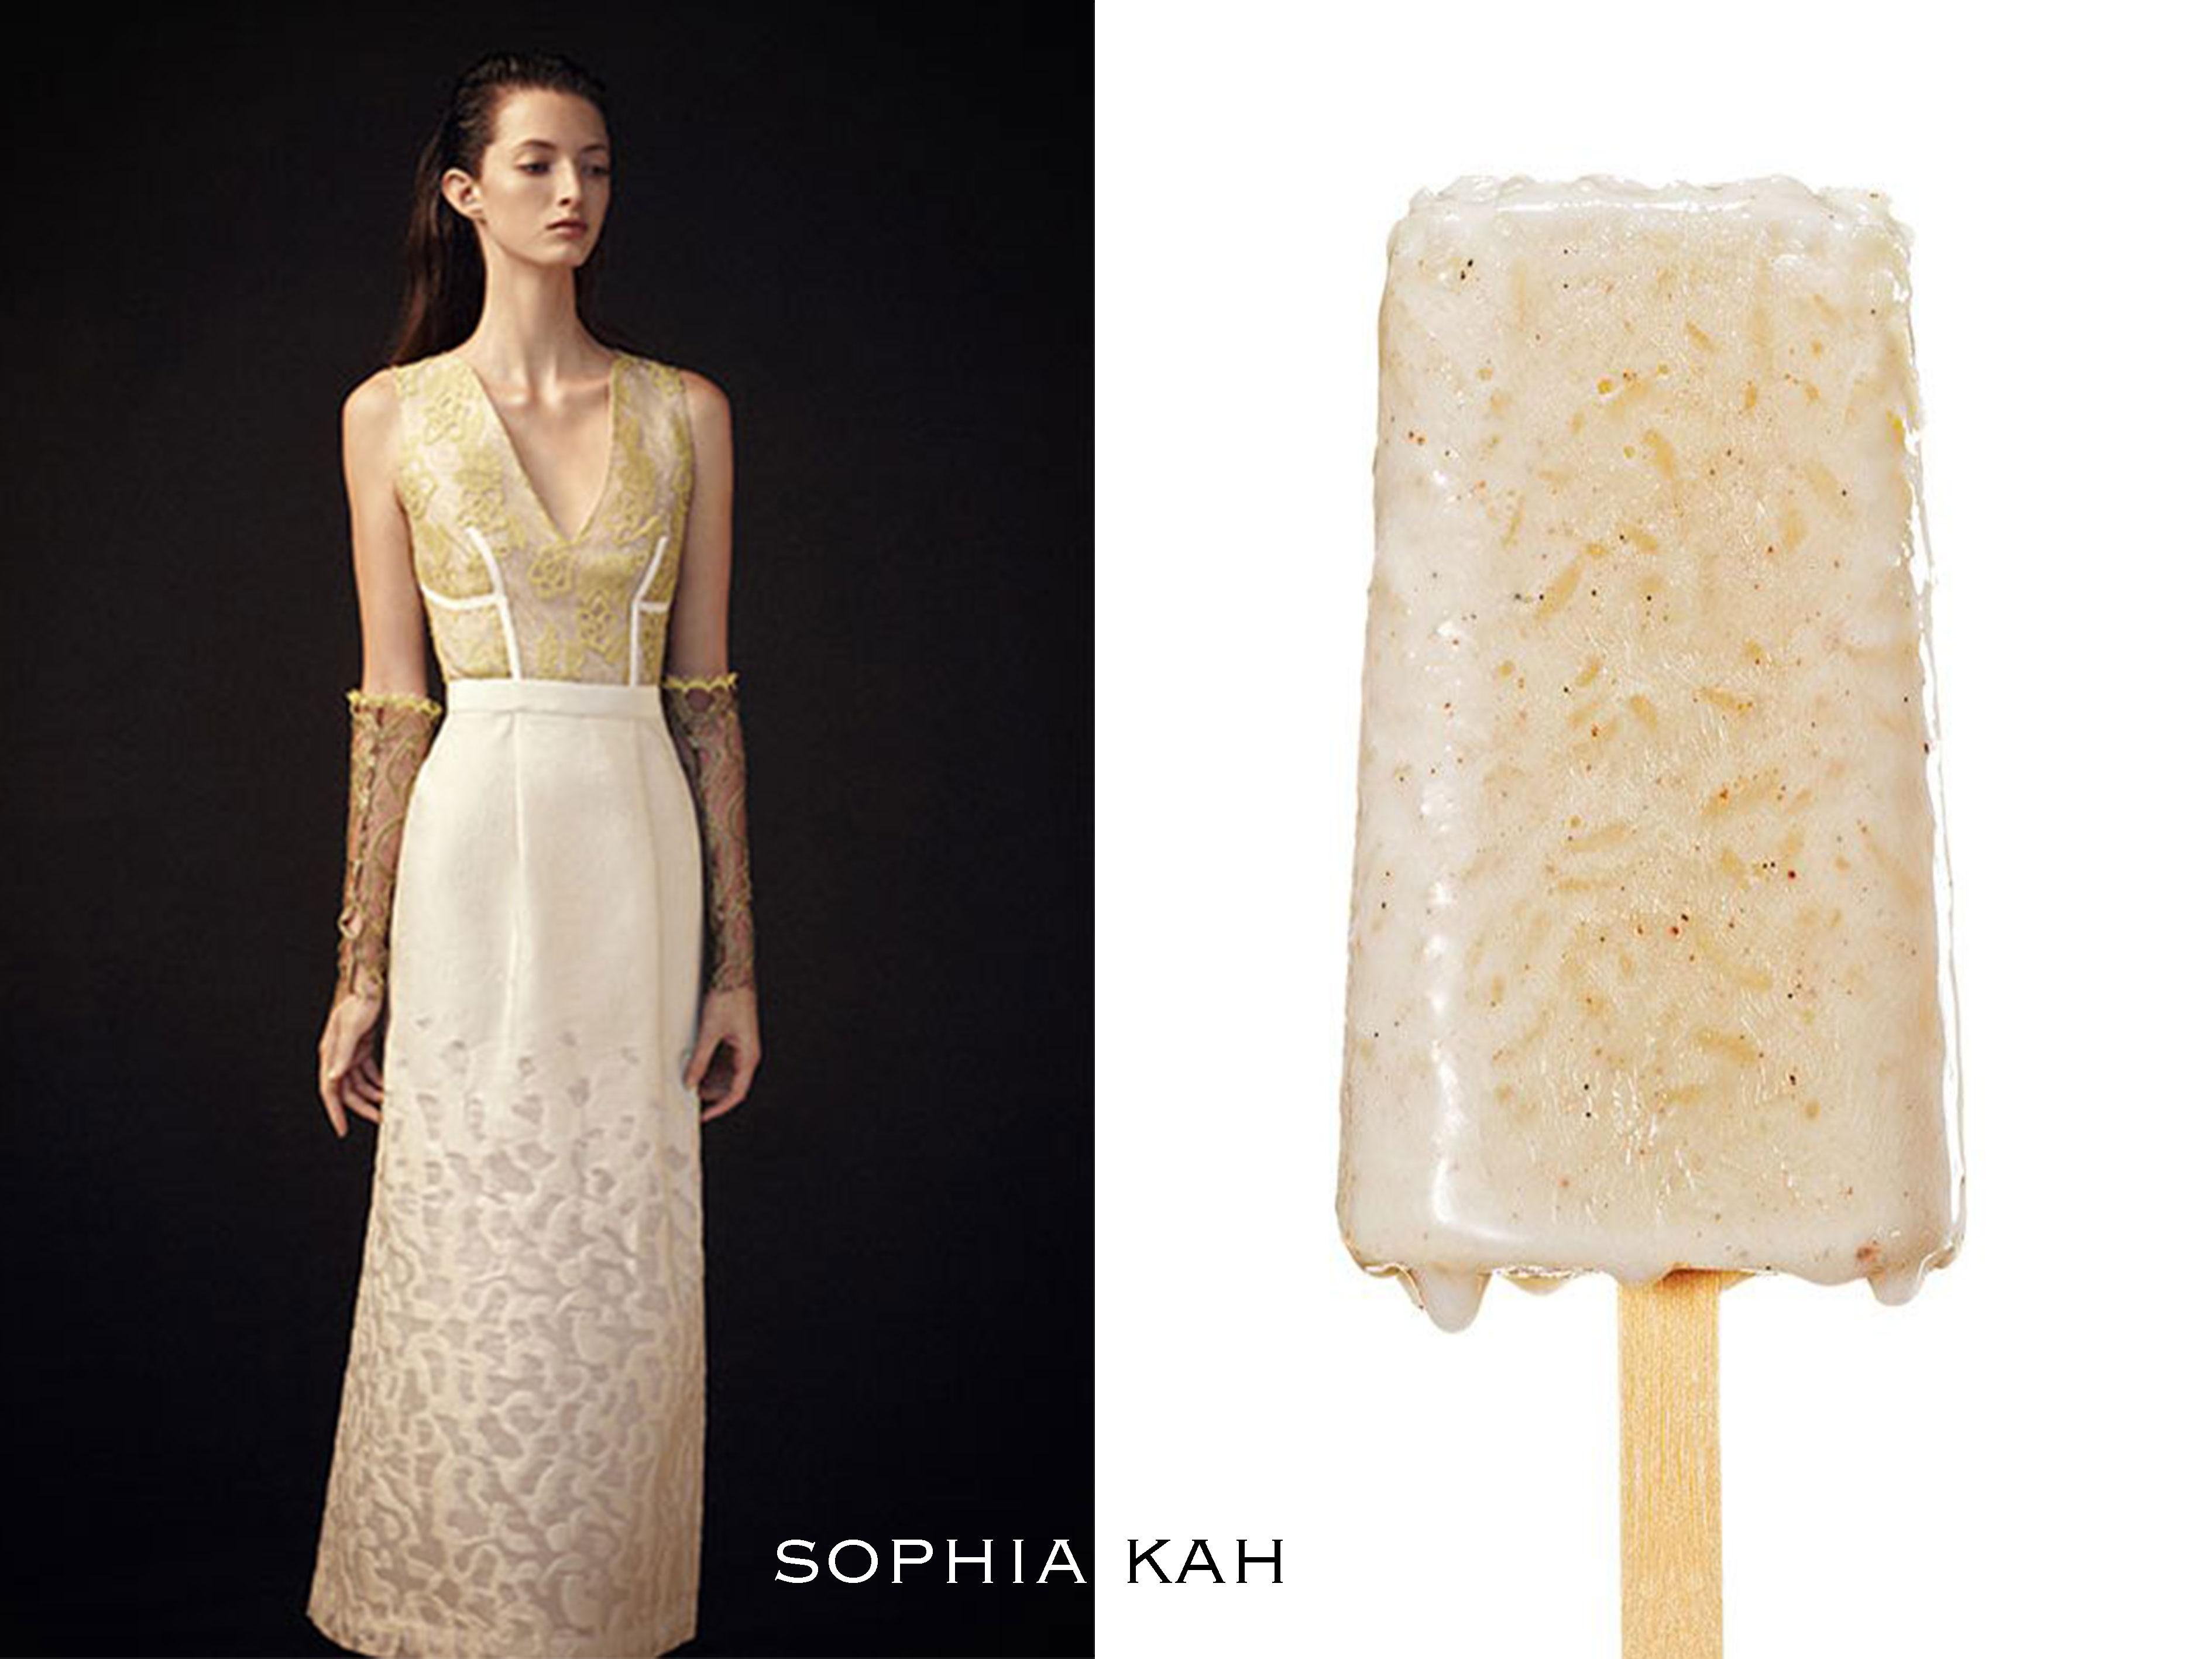 sophia-kah-1